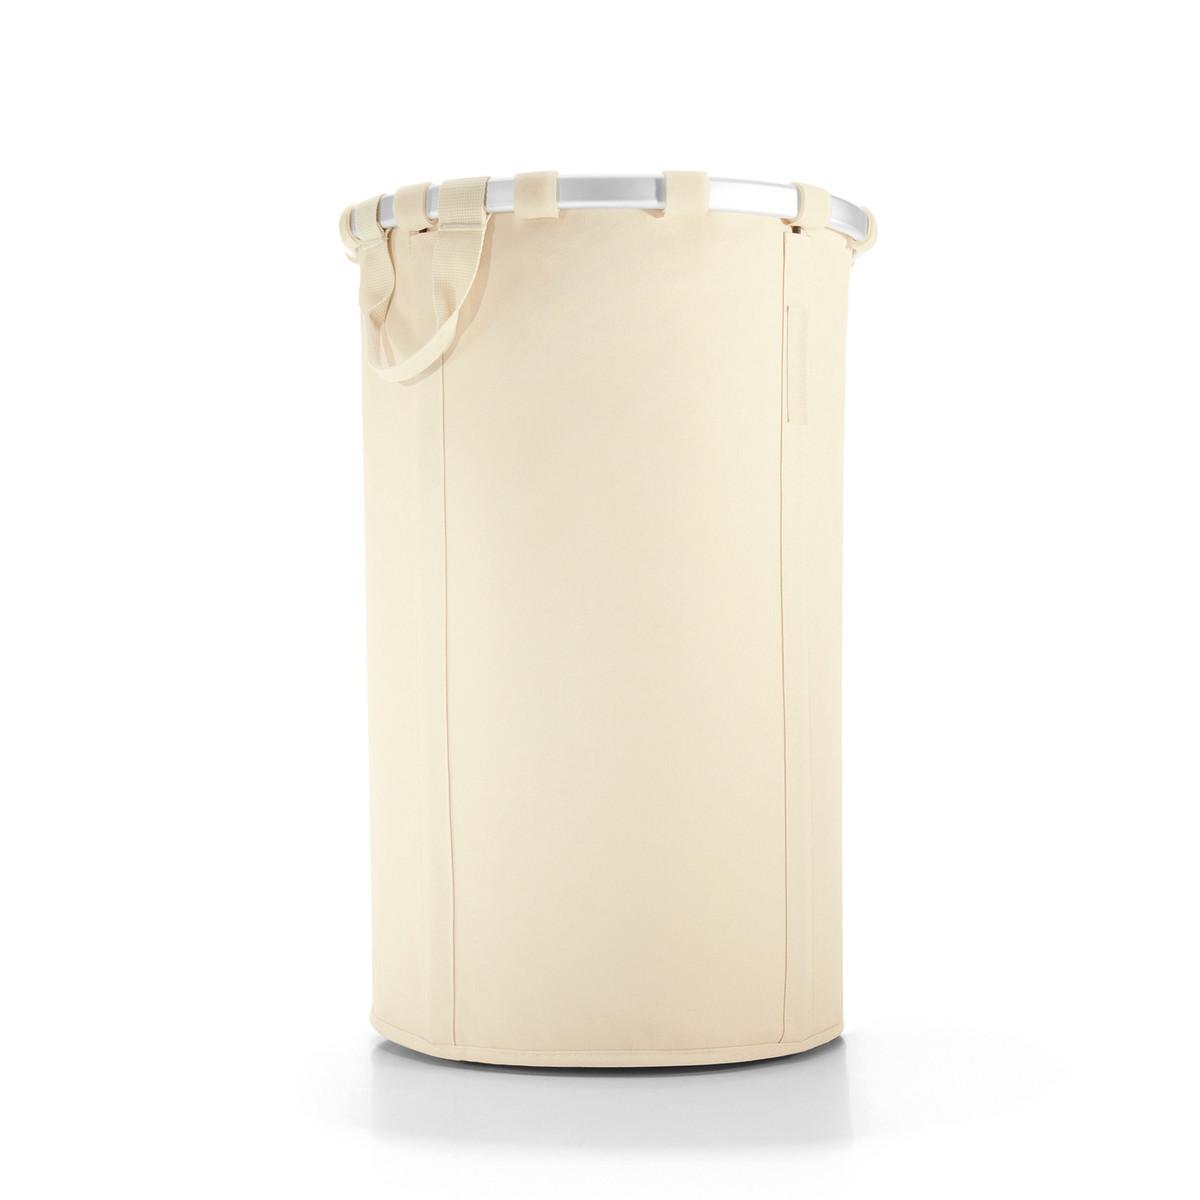 reisenthel accessoires reisenthel laundrybasket sand. Black Bedroom Furniture Sets. Home Design Ideas